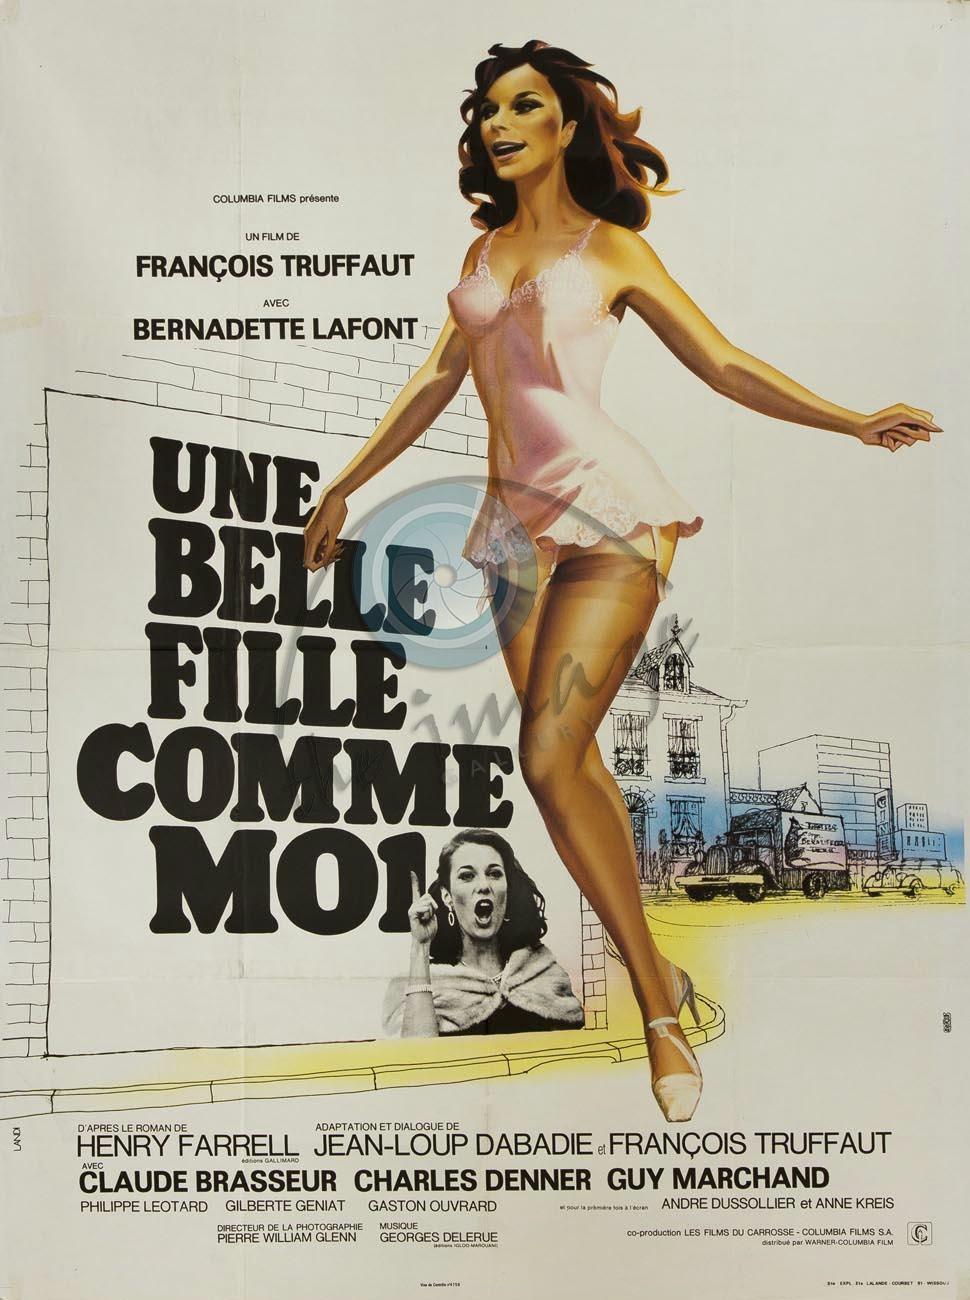 eugenio em filmes camille bliss lana truffaut no burlesco e na - Chambre Verte Truffaut